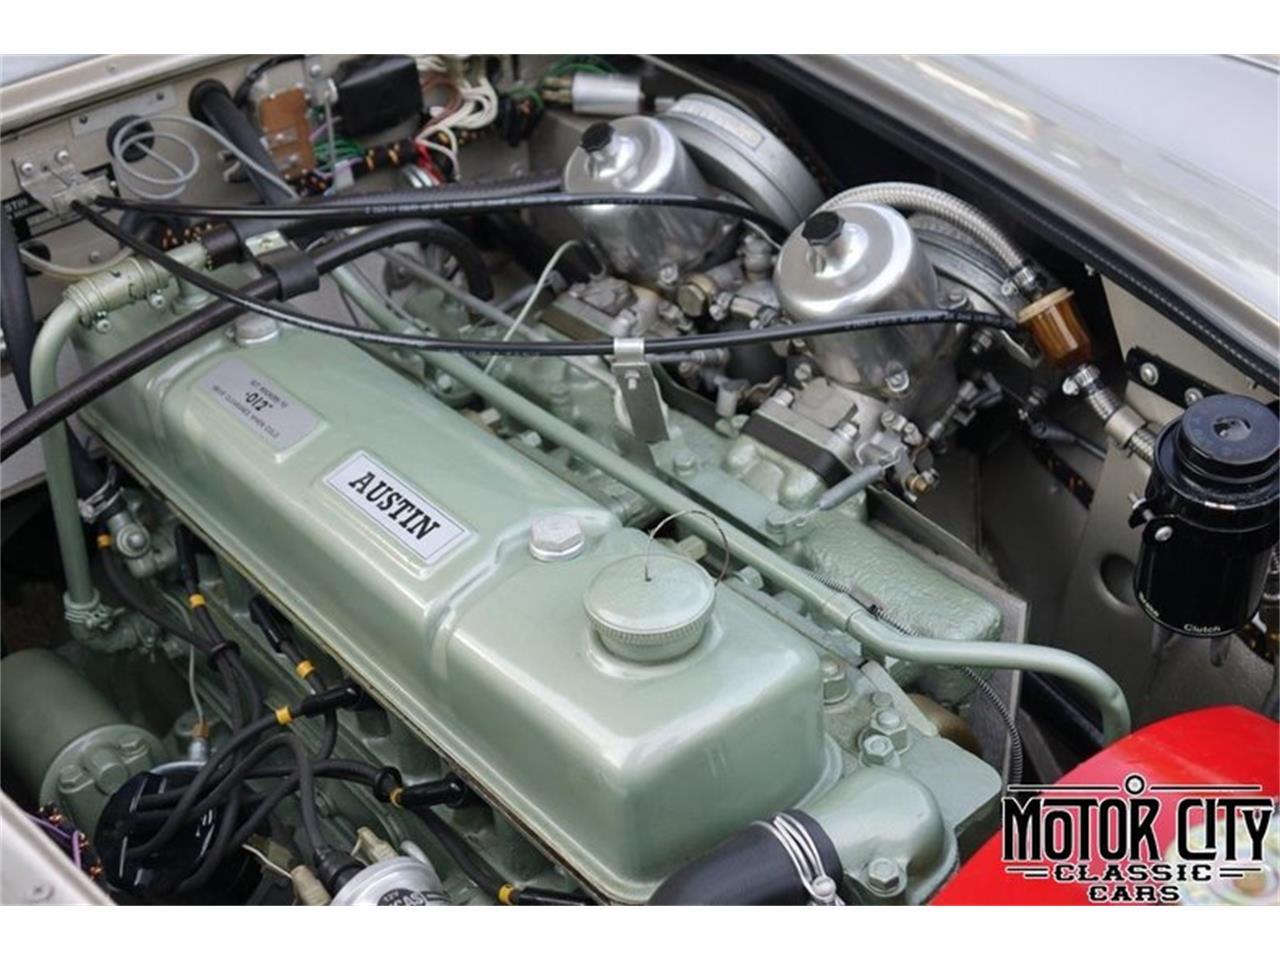 1965 Austin-Healey 3000 Mark III BJ8 (CC-1232309) for sale in Vero Beach, Florida